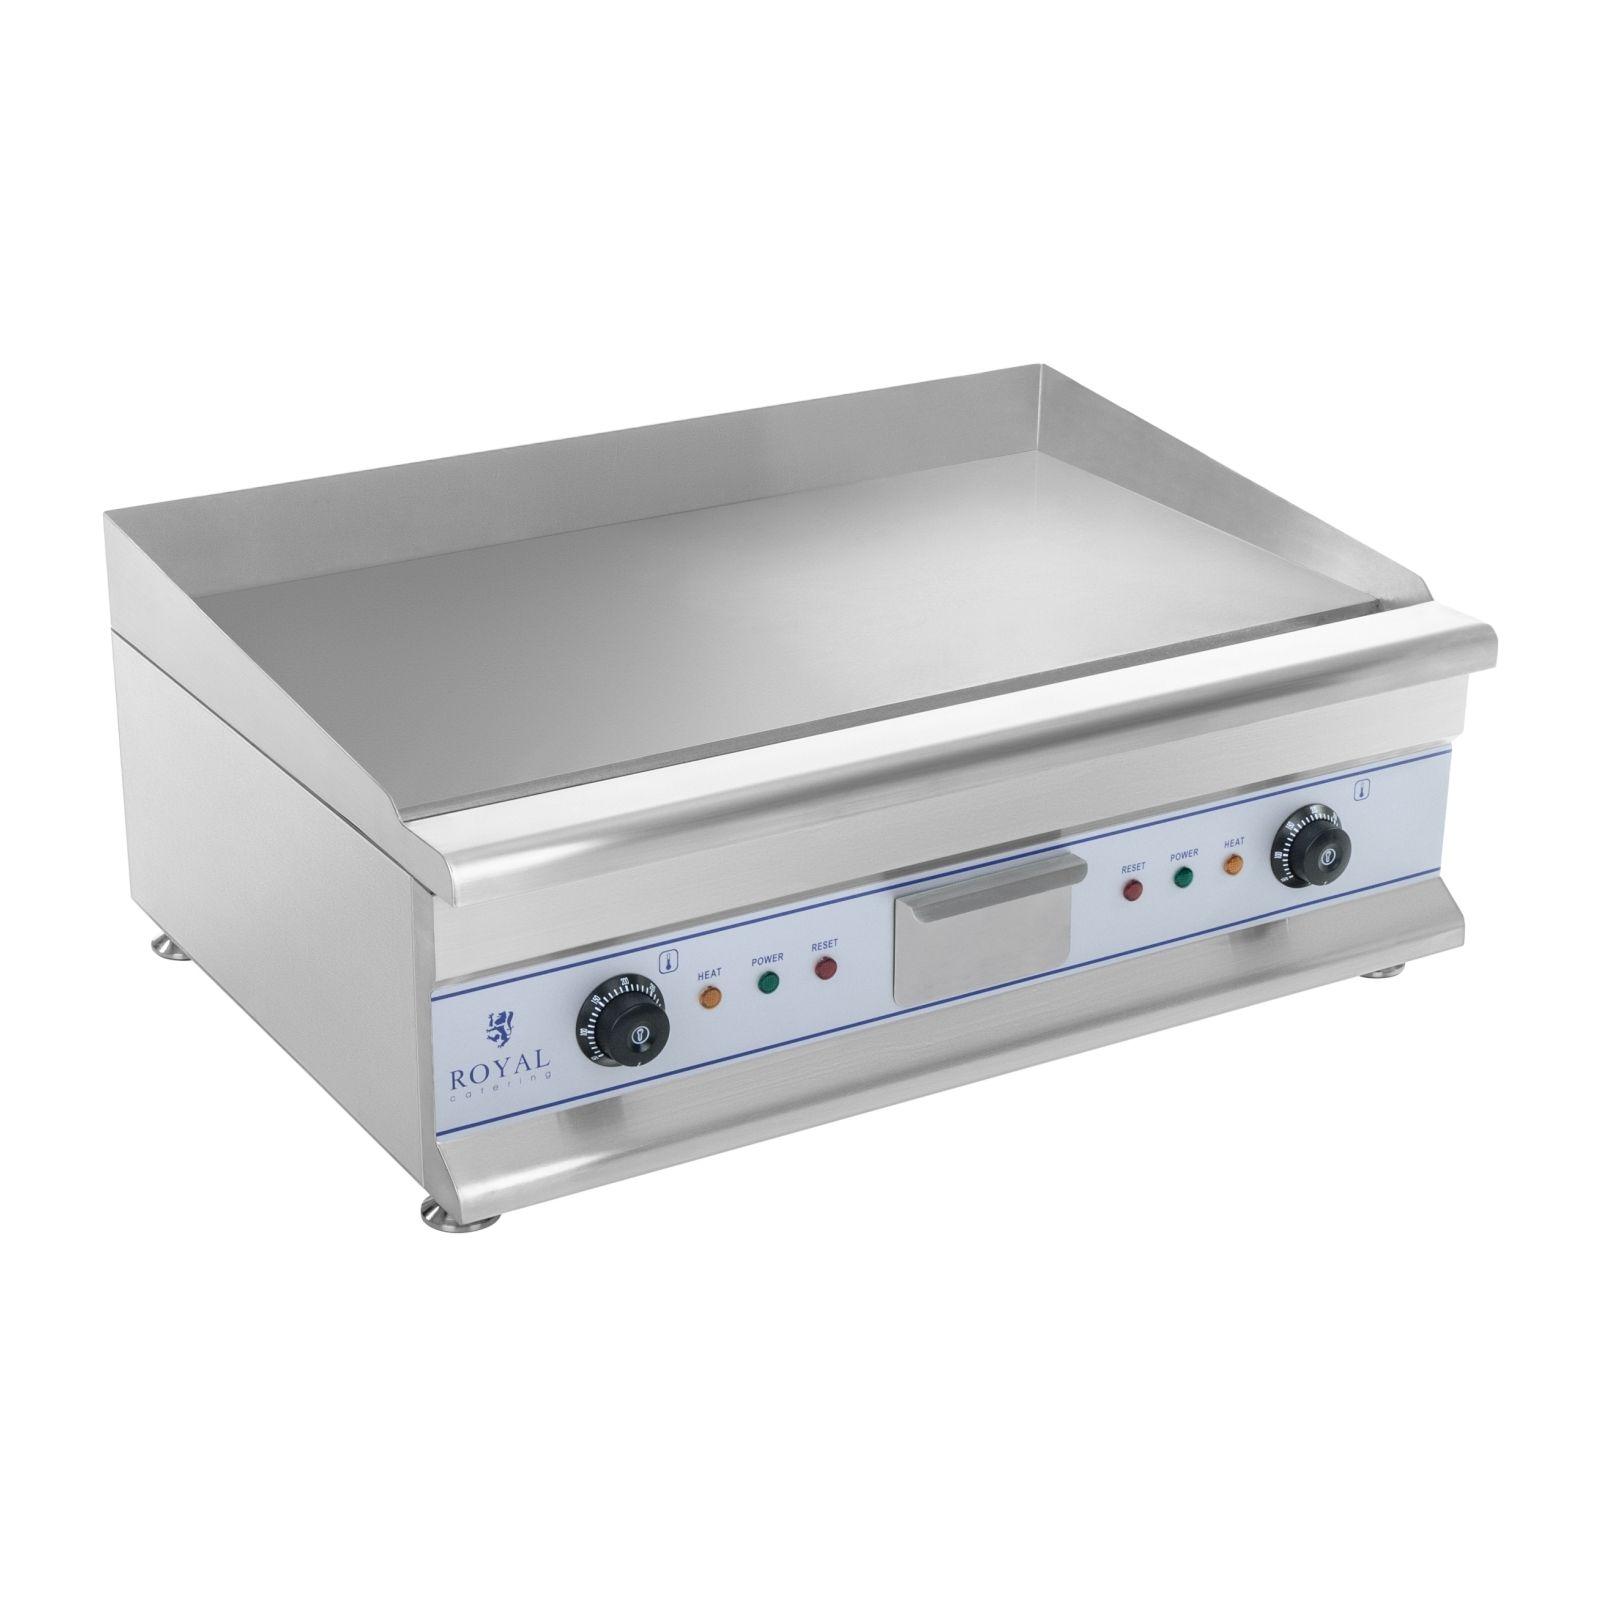 royal catering fry top liscio elettrico - 72,5 cm - liscio - 2 x 3.2 kw - per uso professionale